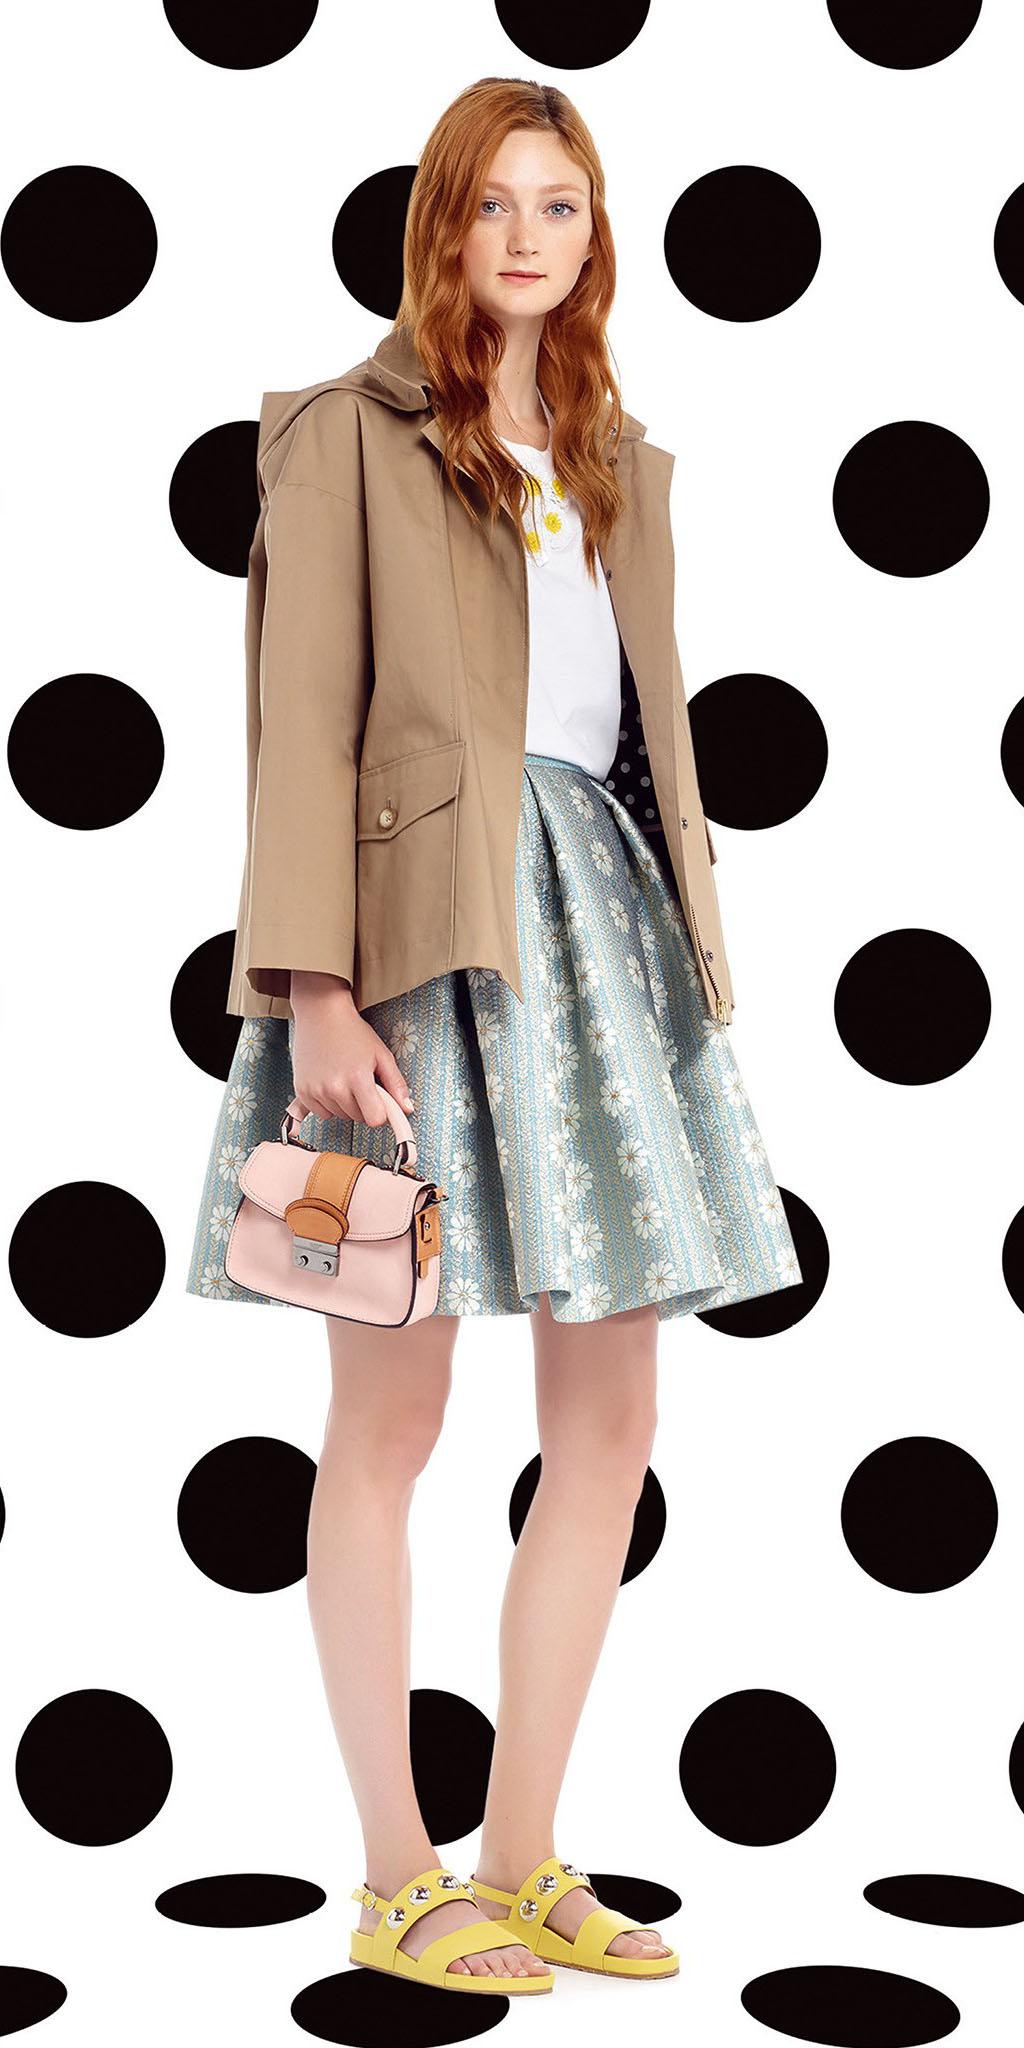 blue-light-mini-skirt-white-tee-yellow-shoe-sandals-pink-bag-tan-jacket-trench-spring-summer-hairr-lunch.jpg